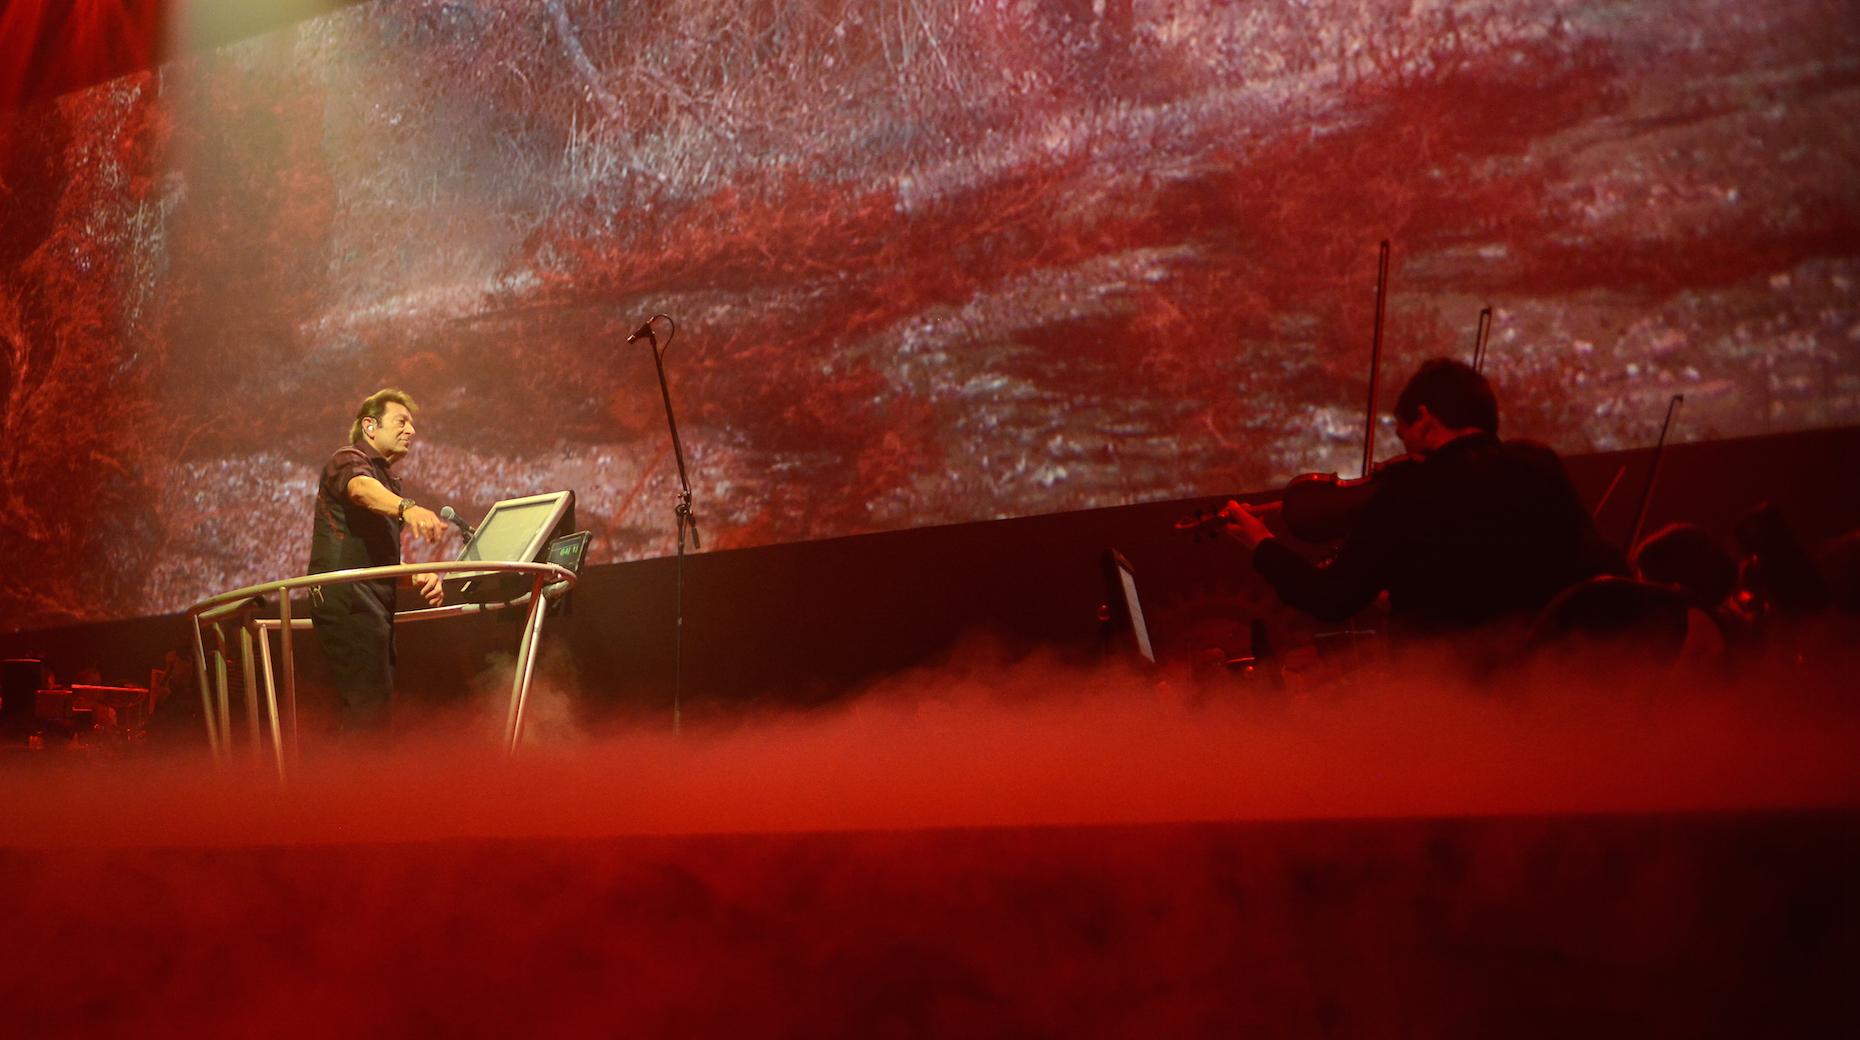 Jeff-Wayne-Sibelius-1862x1040-min